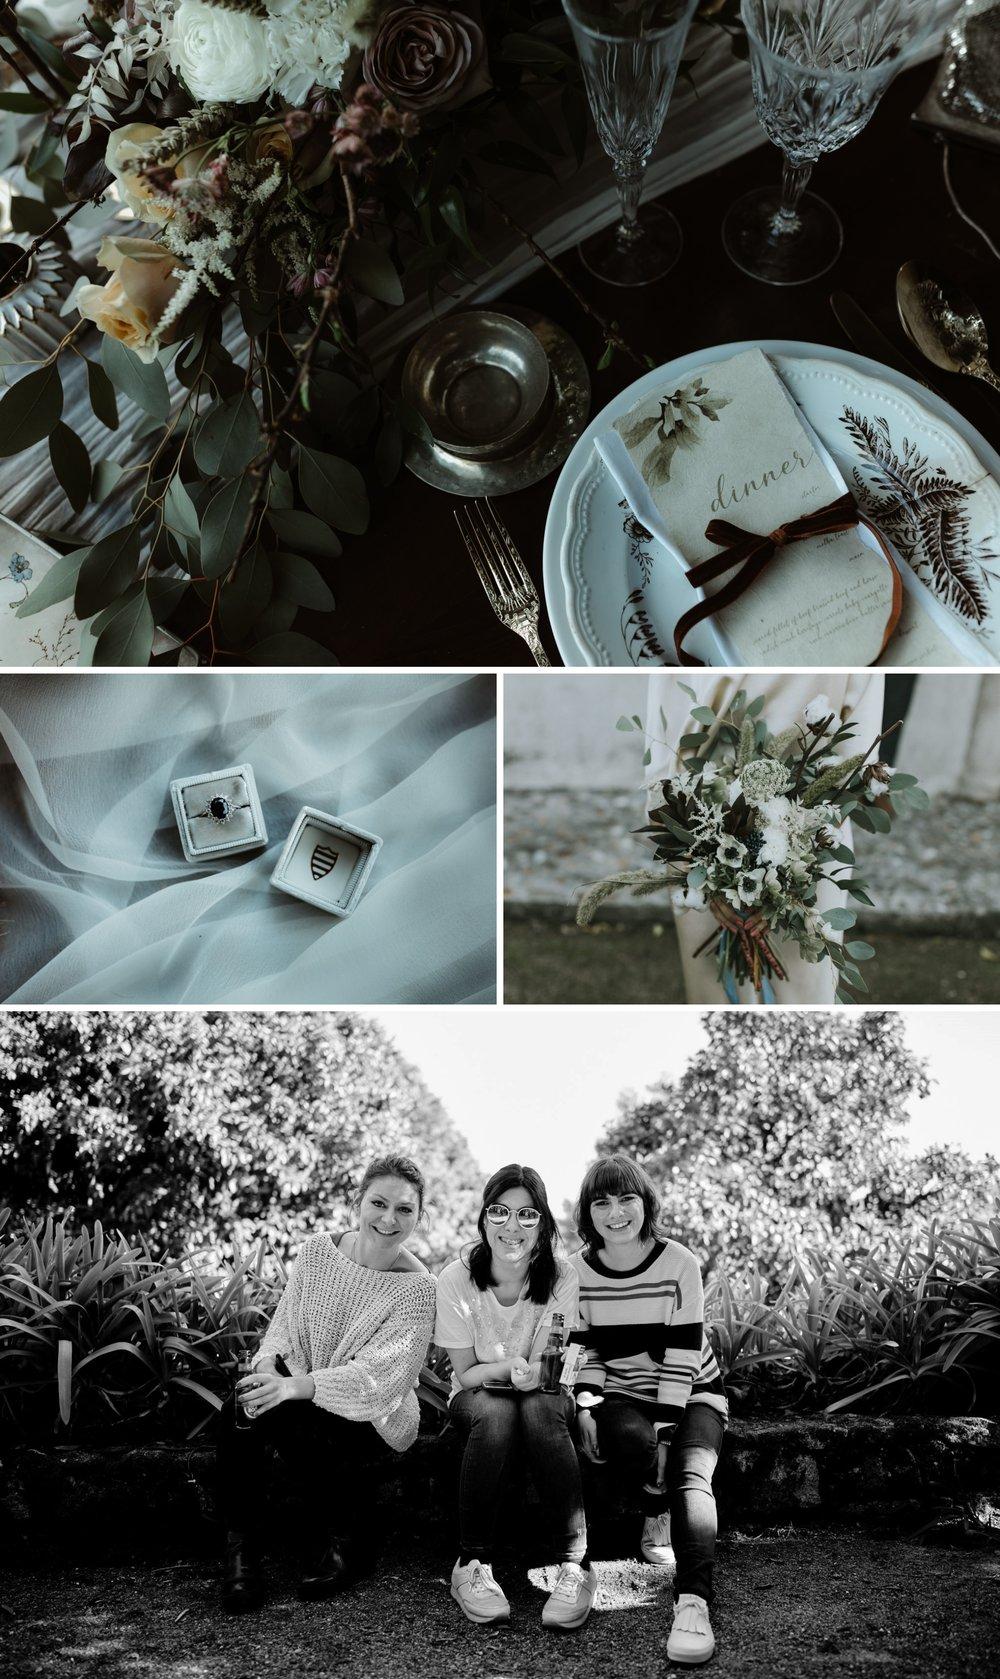 Pics by Laetitia Donaghy + Paulo Mainha